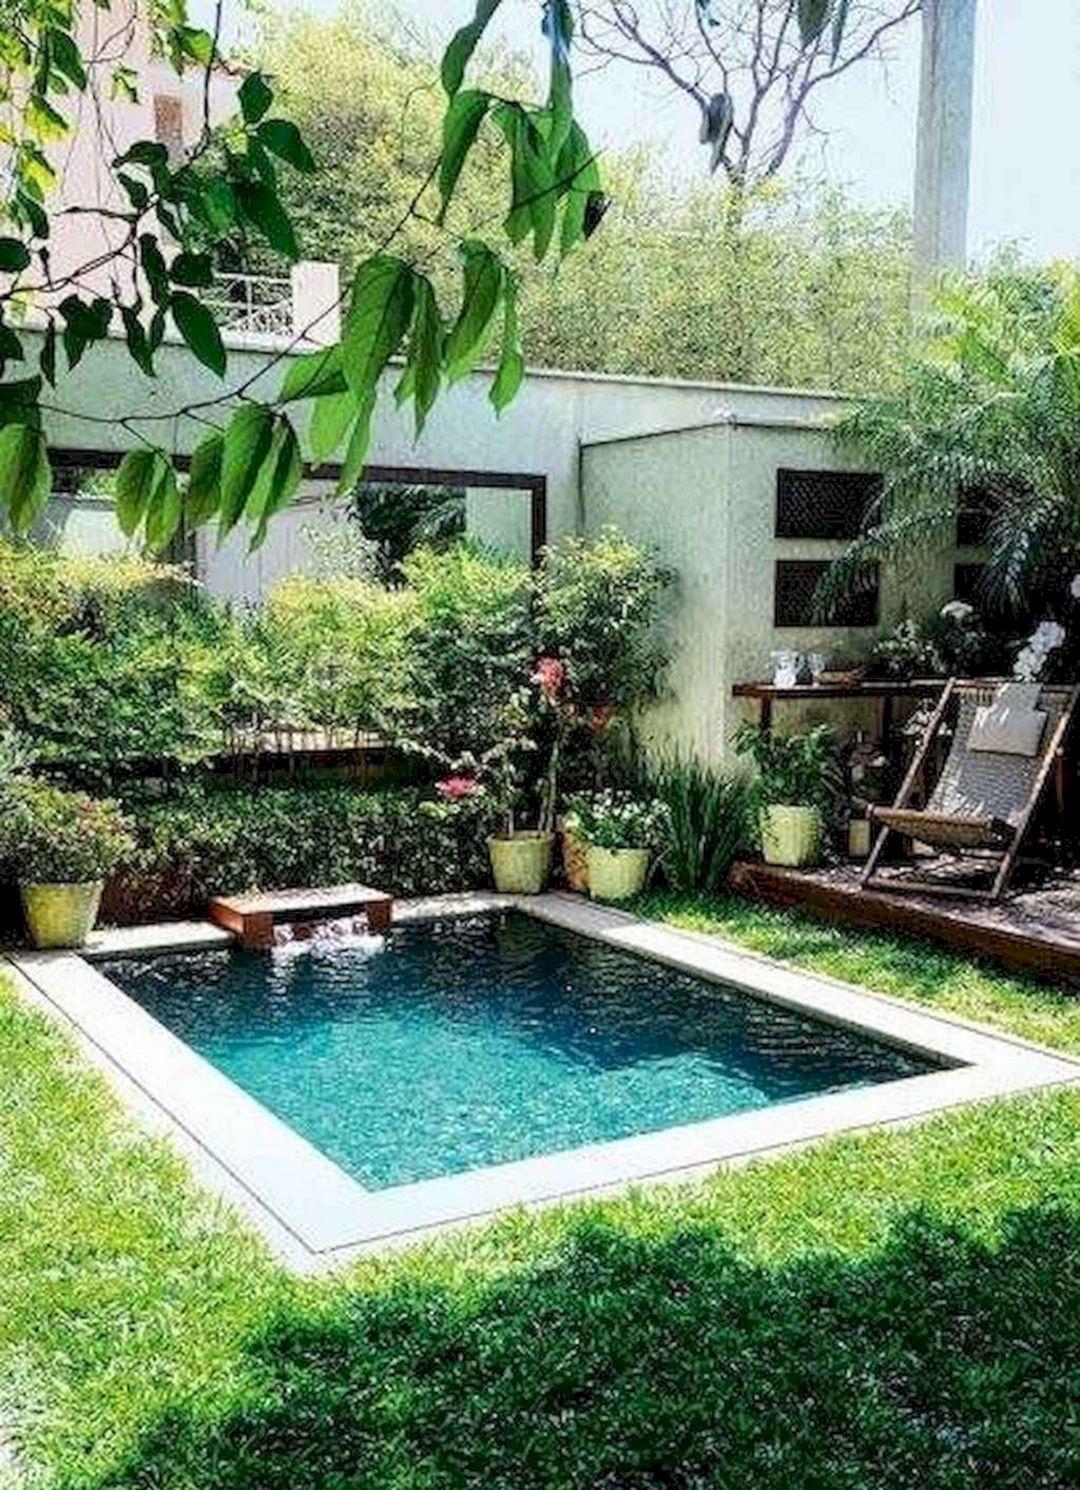 15 Incredible Small Landscaping Design With Mini Pool Ideas Small Backyard Pools Backyard Pool Landscaping Terrace Garden Design